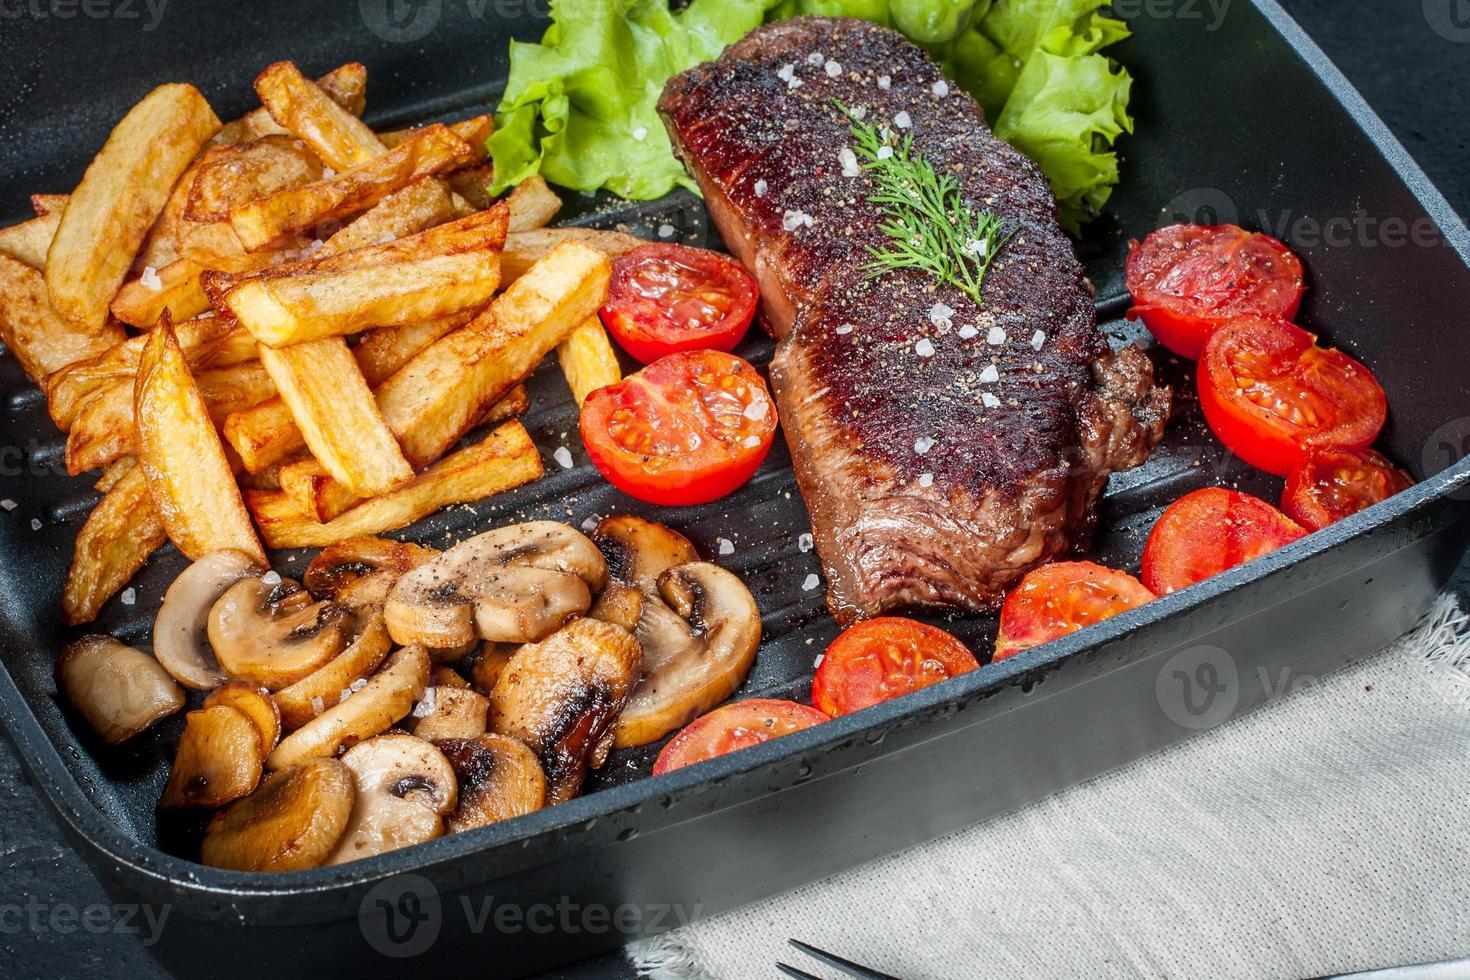 steak frit avec frites. photo